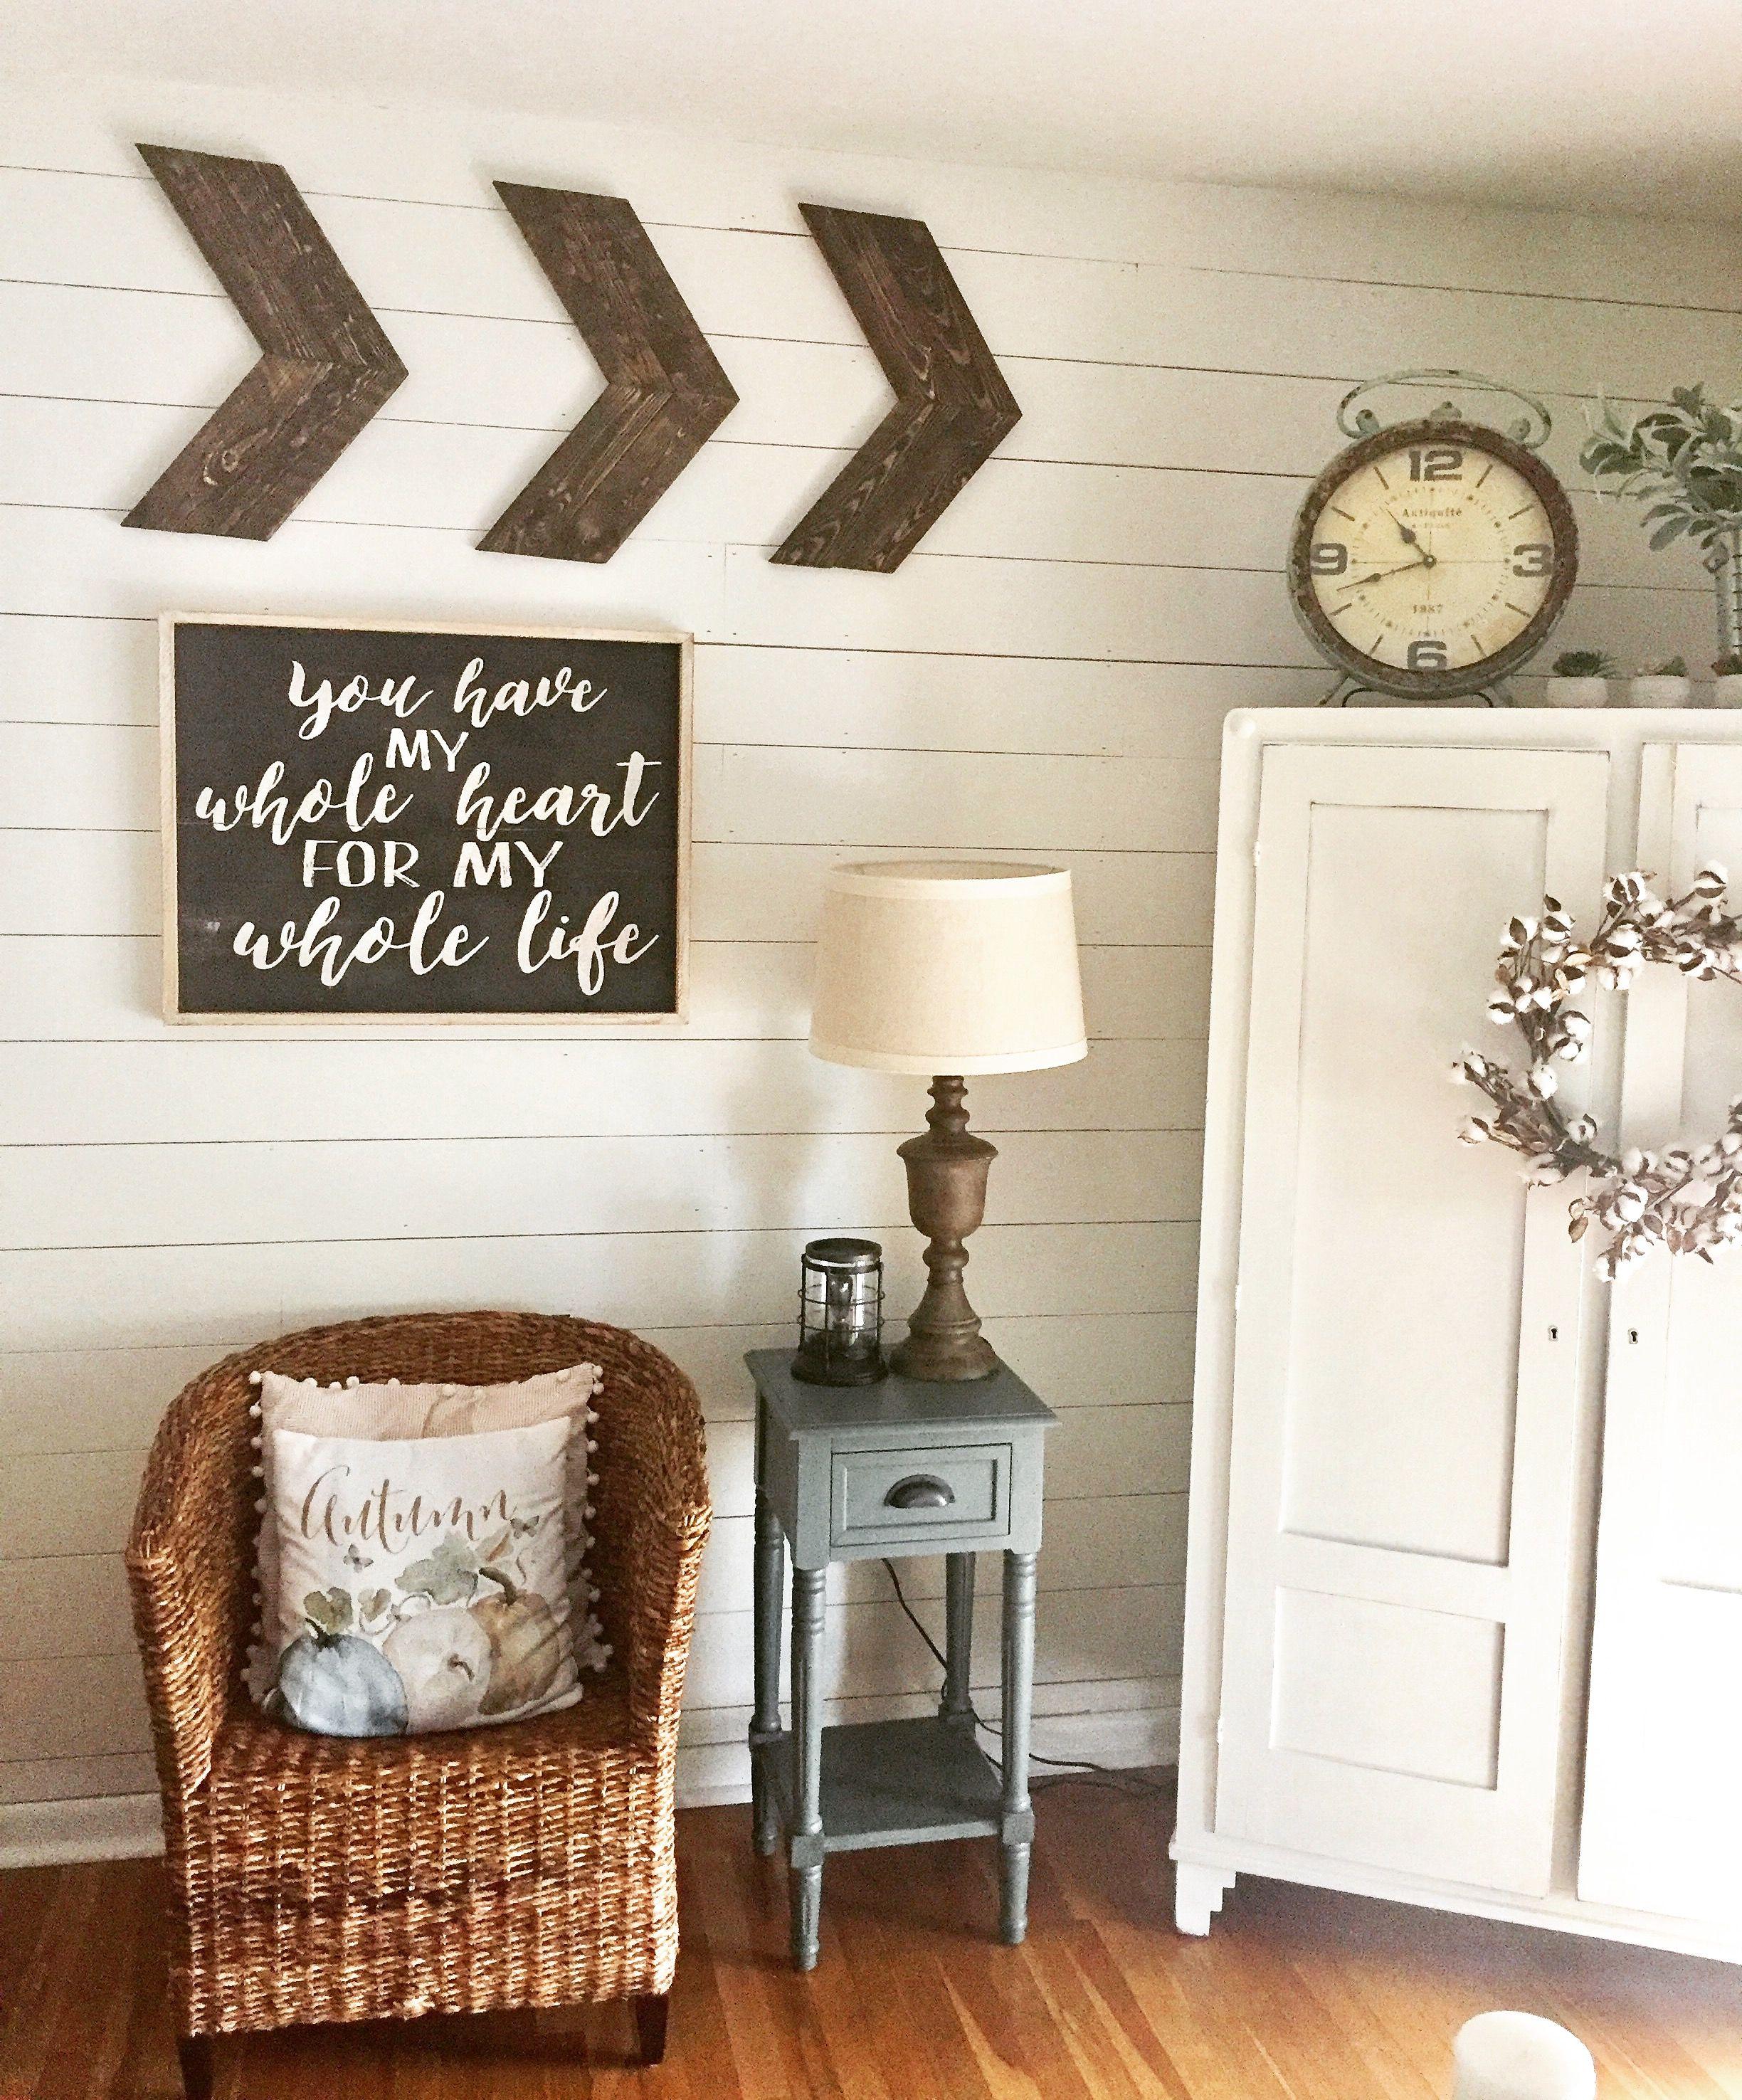 Fixer upper inspired living room Farmhouse feel with shiplap